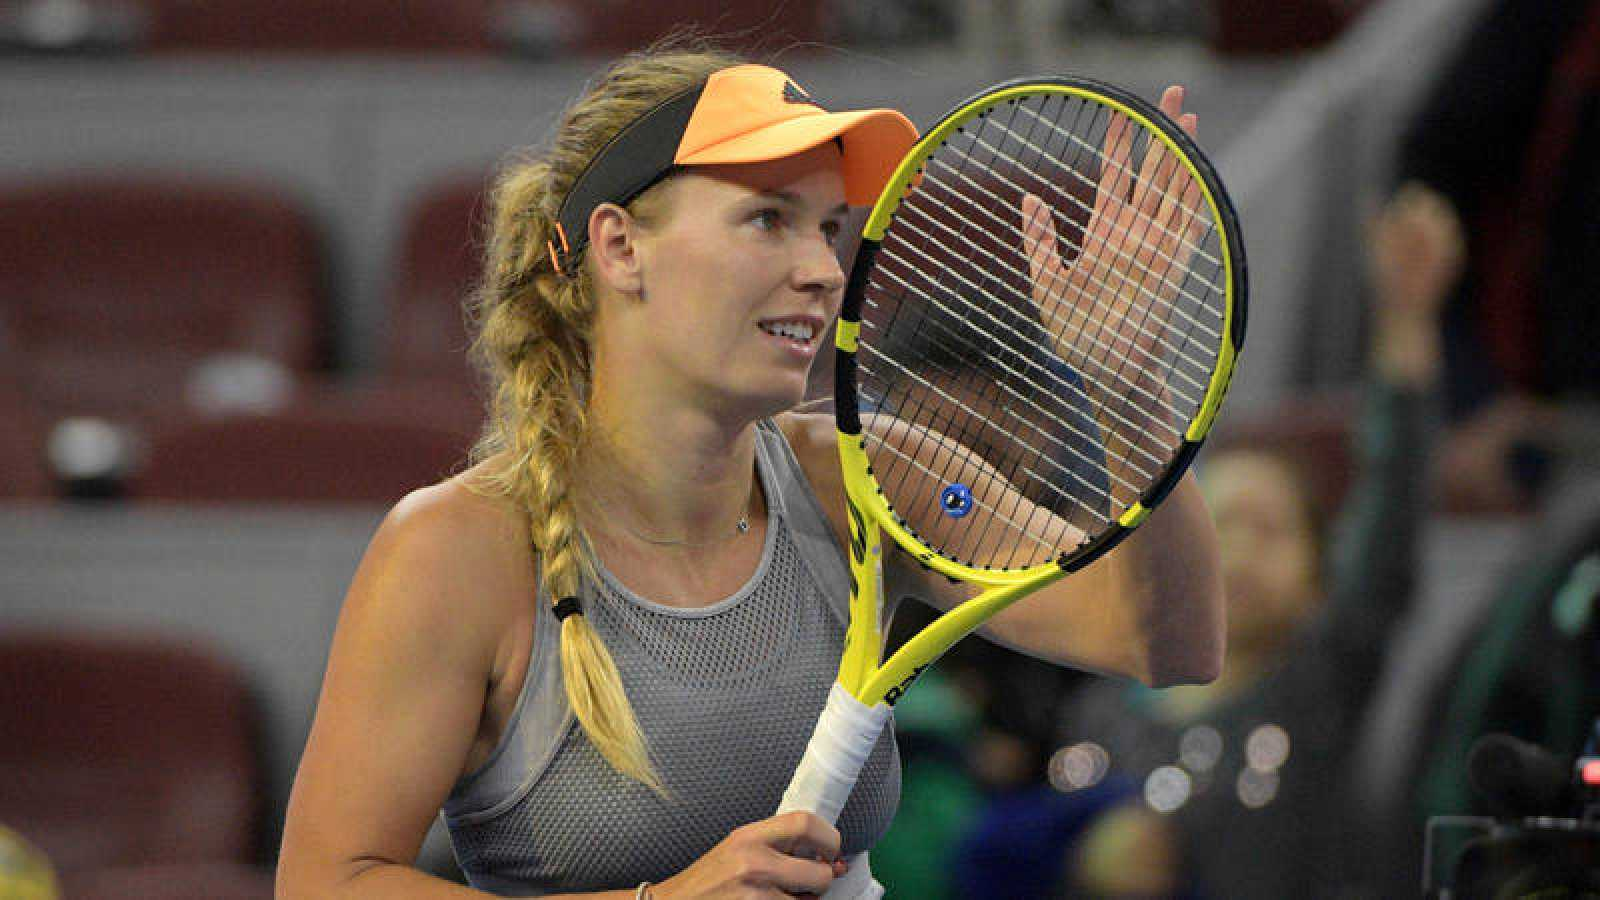 Wozniacki colgará la raqueta después del Abierto de Australia